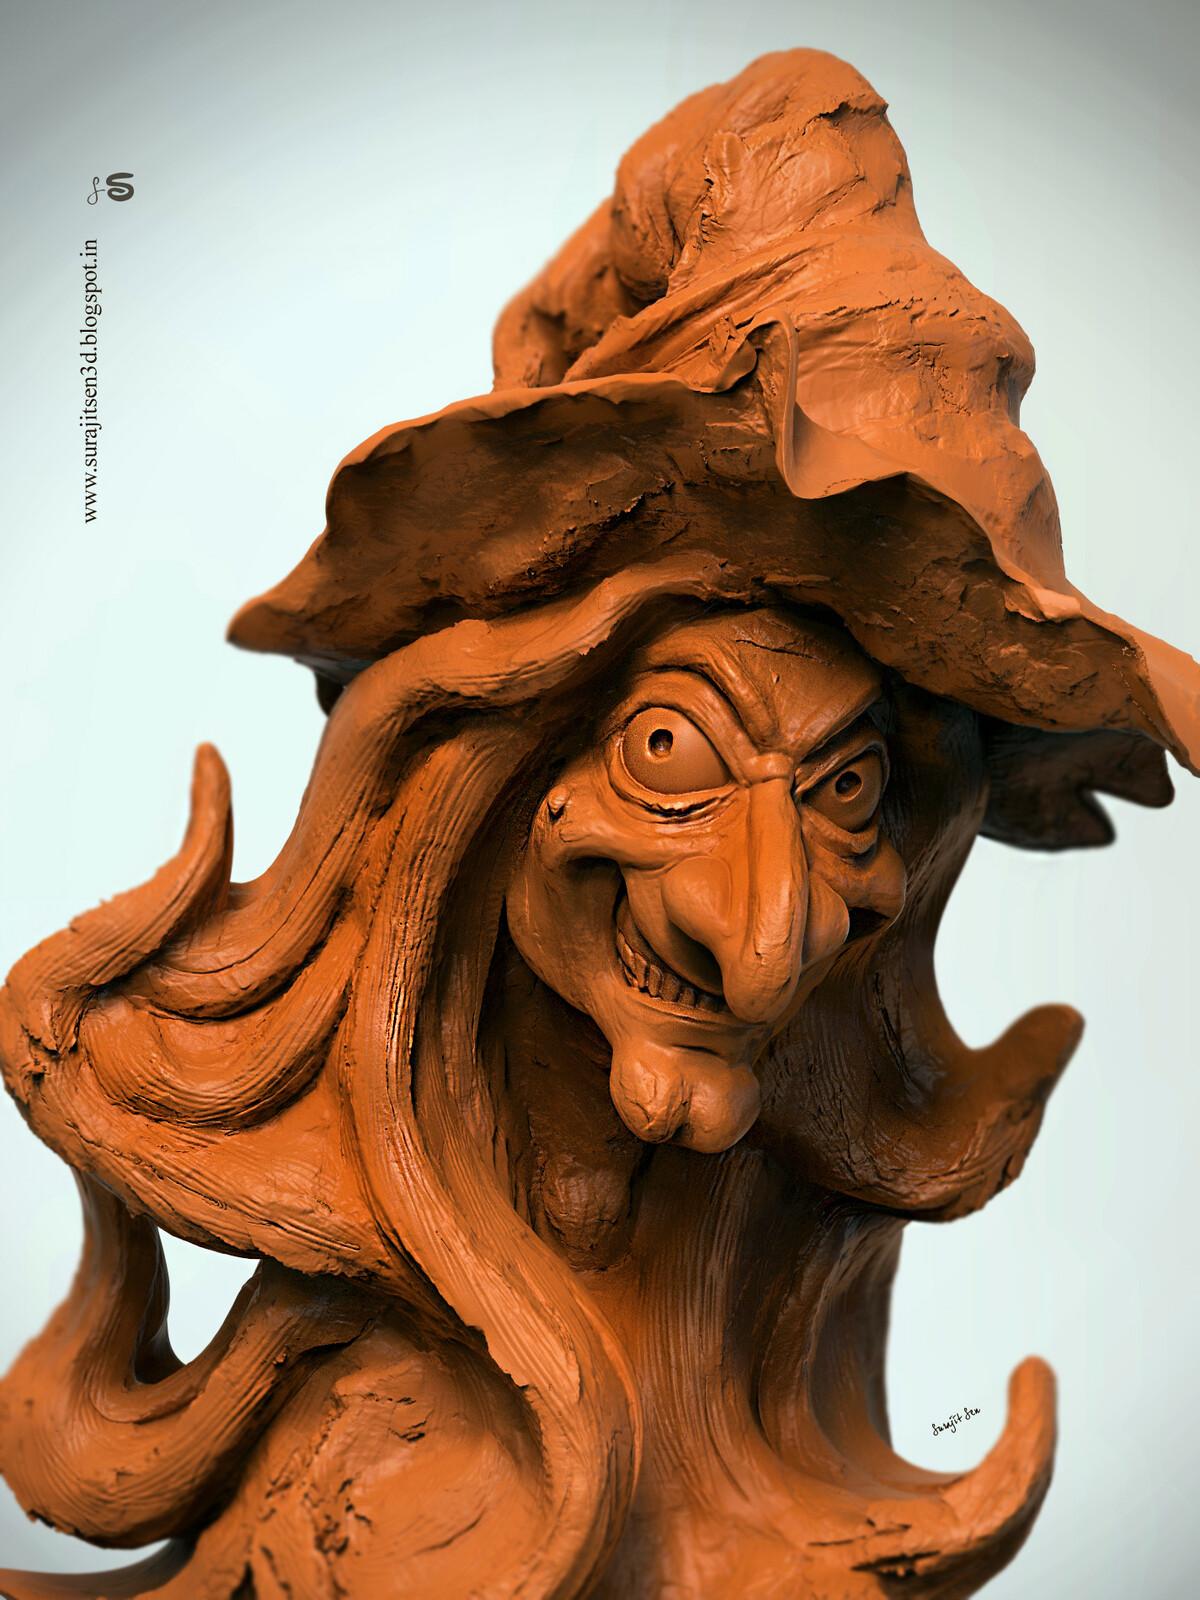 #doodle #quicksculpt #study #witchsculpture...one of my speed Digital sculpt study.